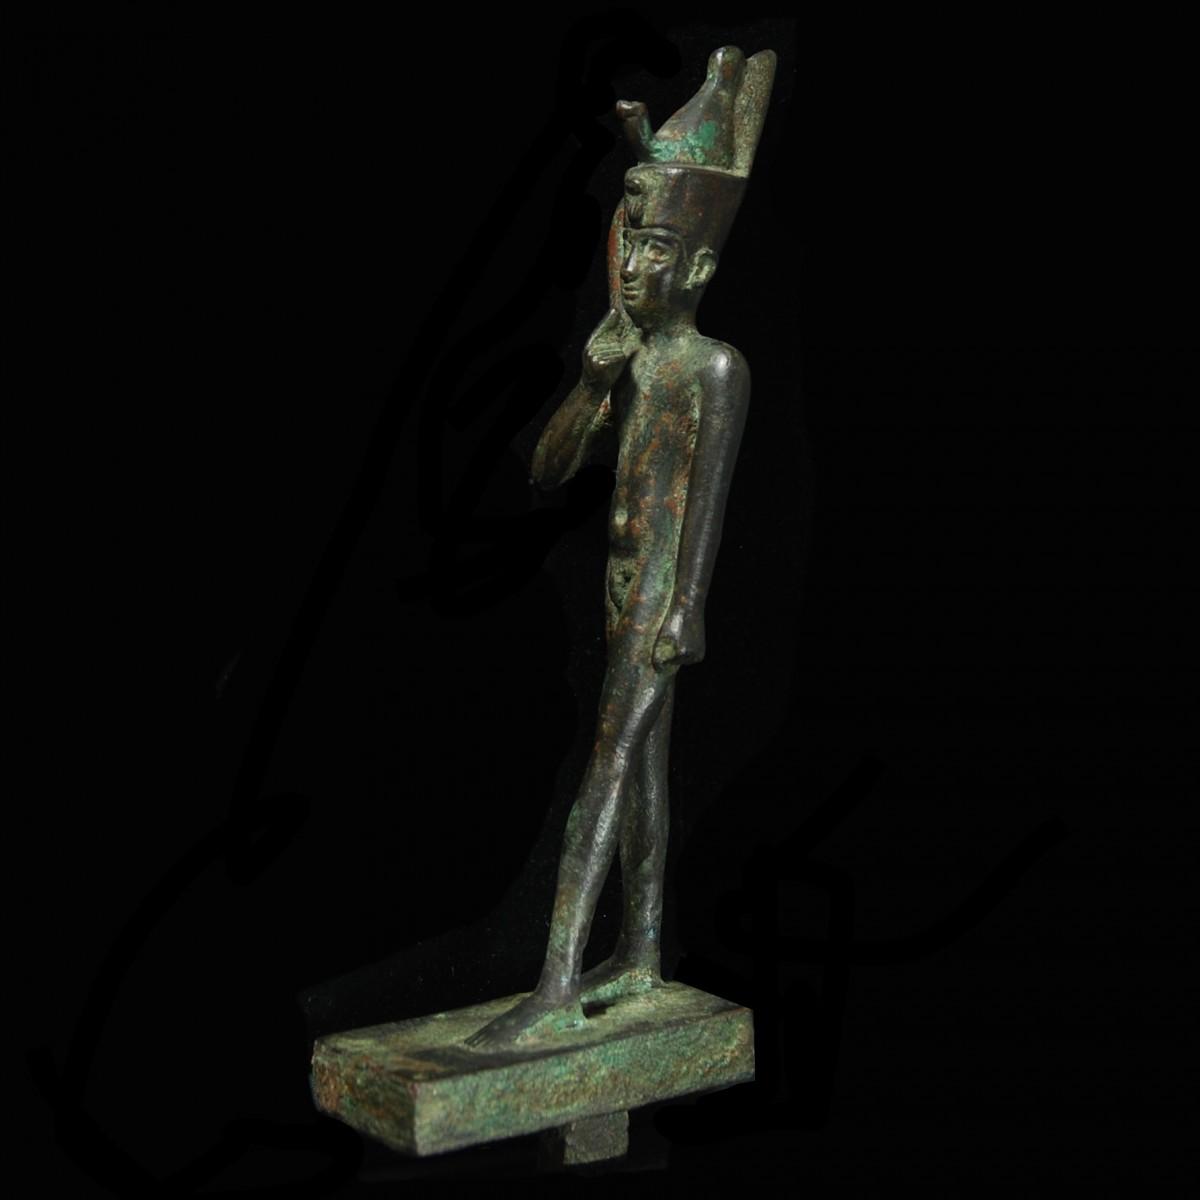 Egyptian Bronze statuette of Harpocrates half left